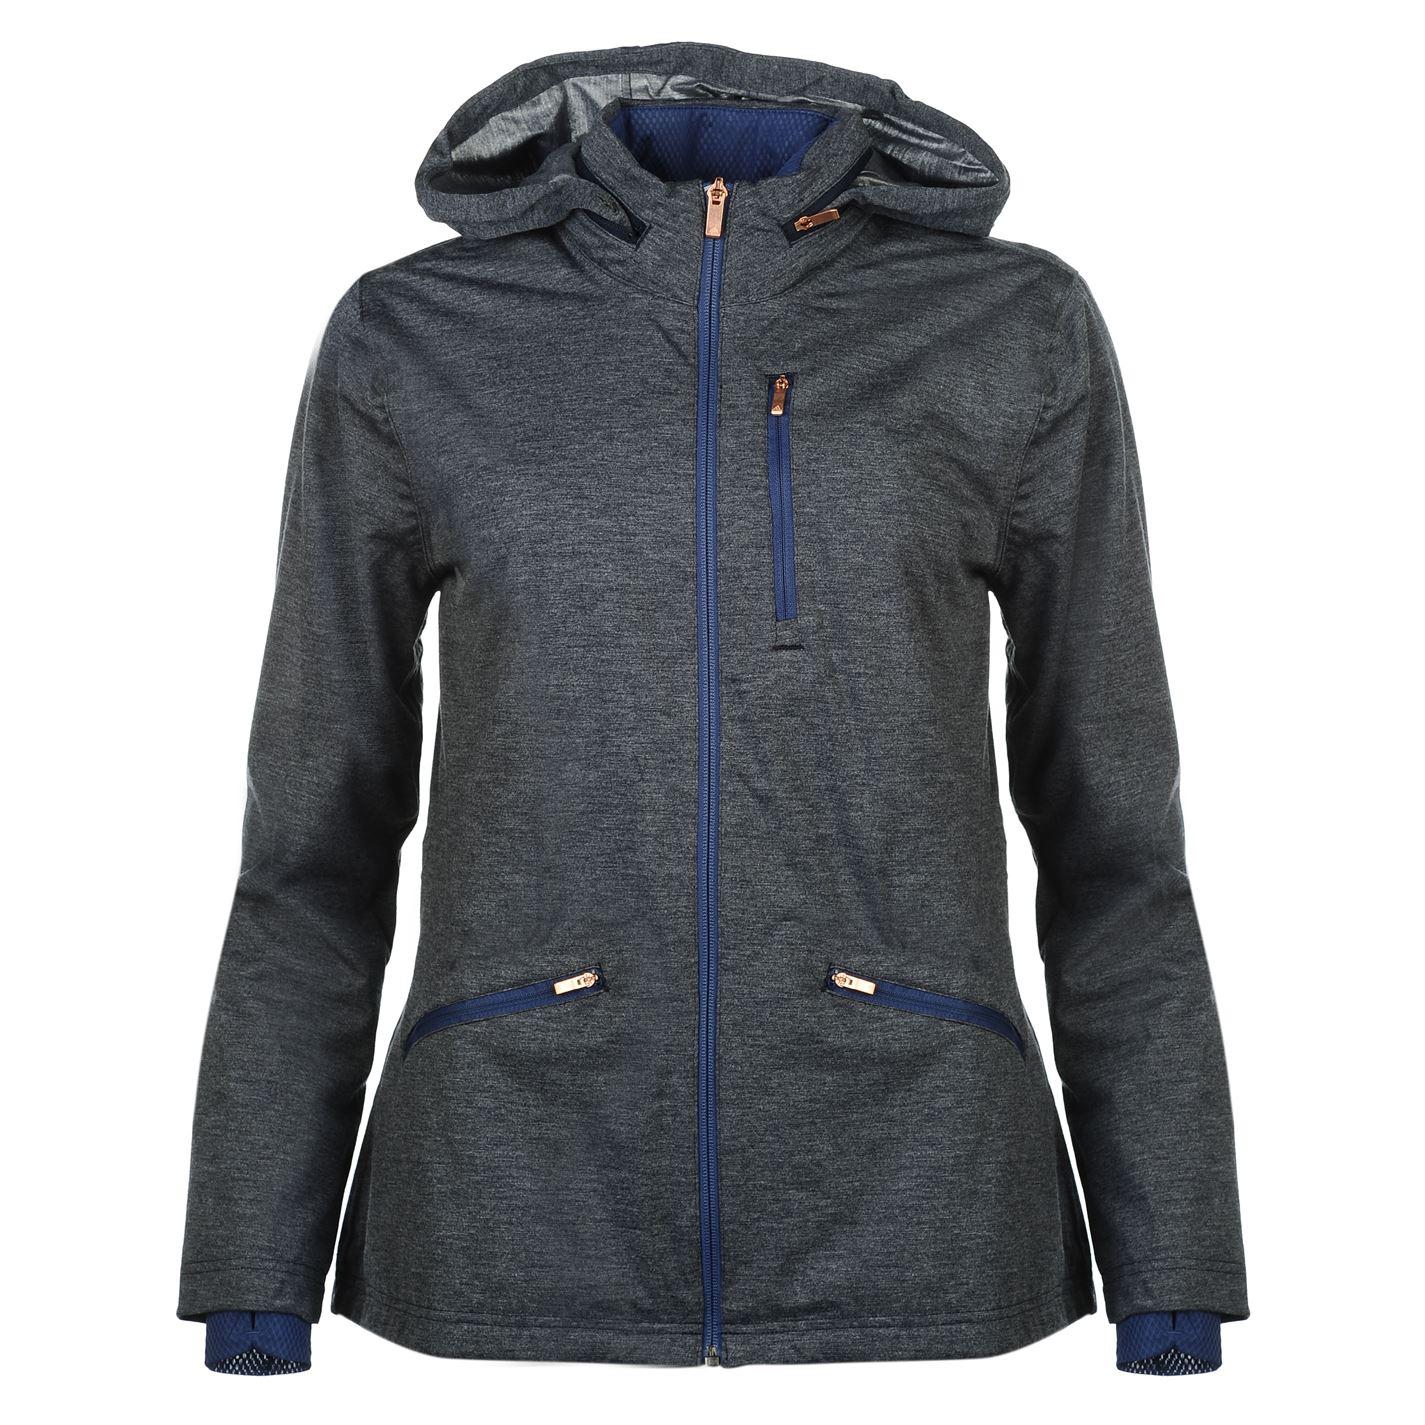 Adidas Softshell Golf Jacket Ladies